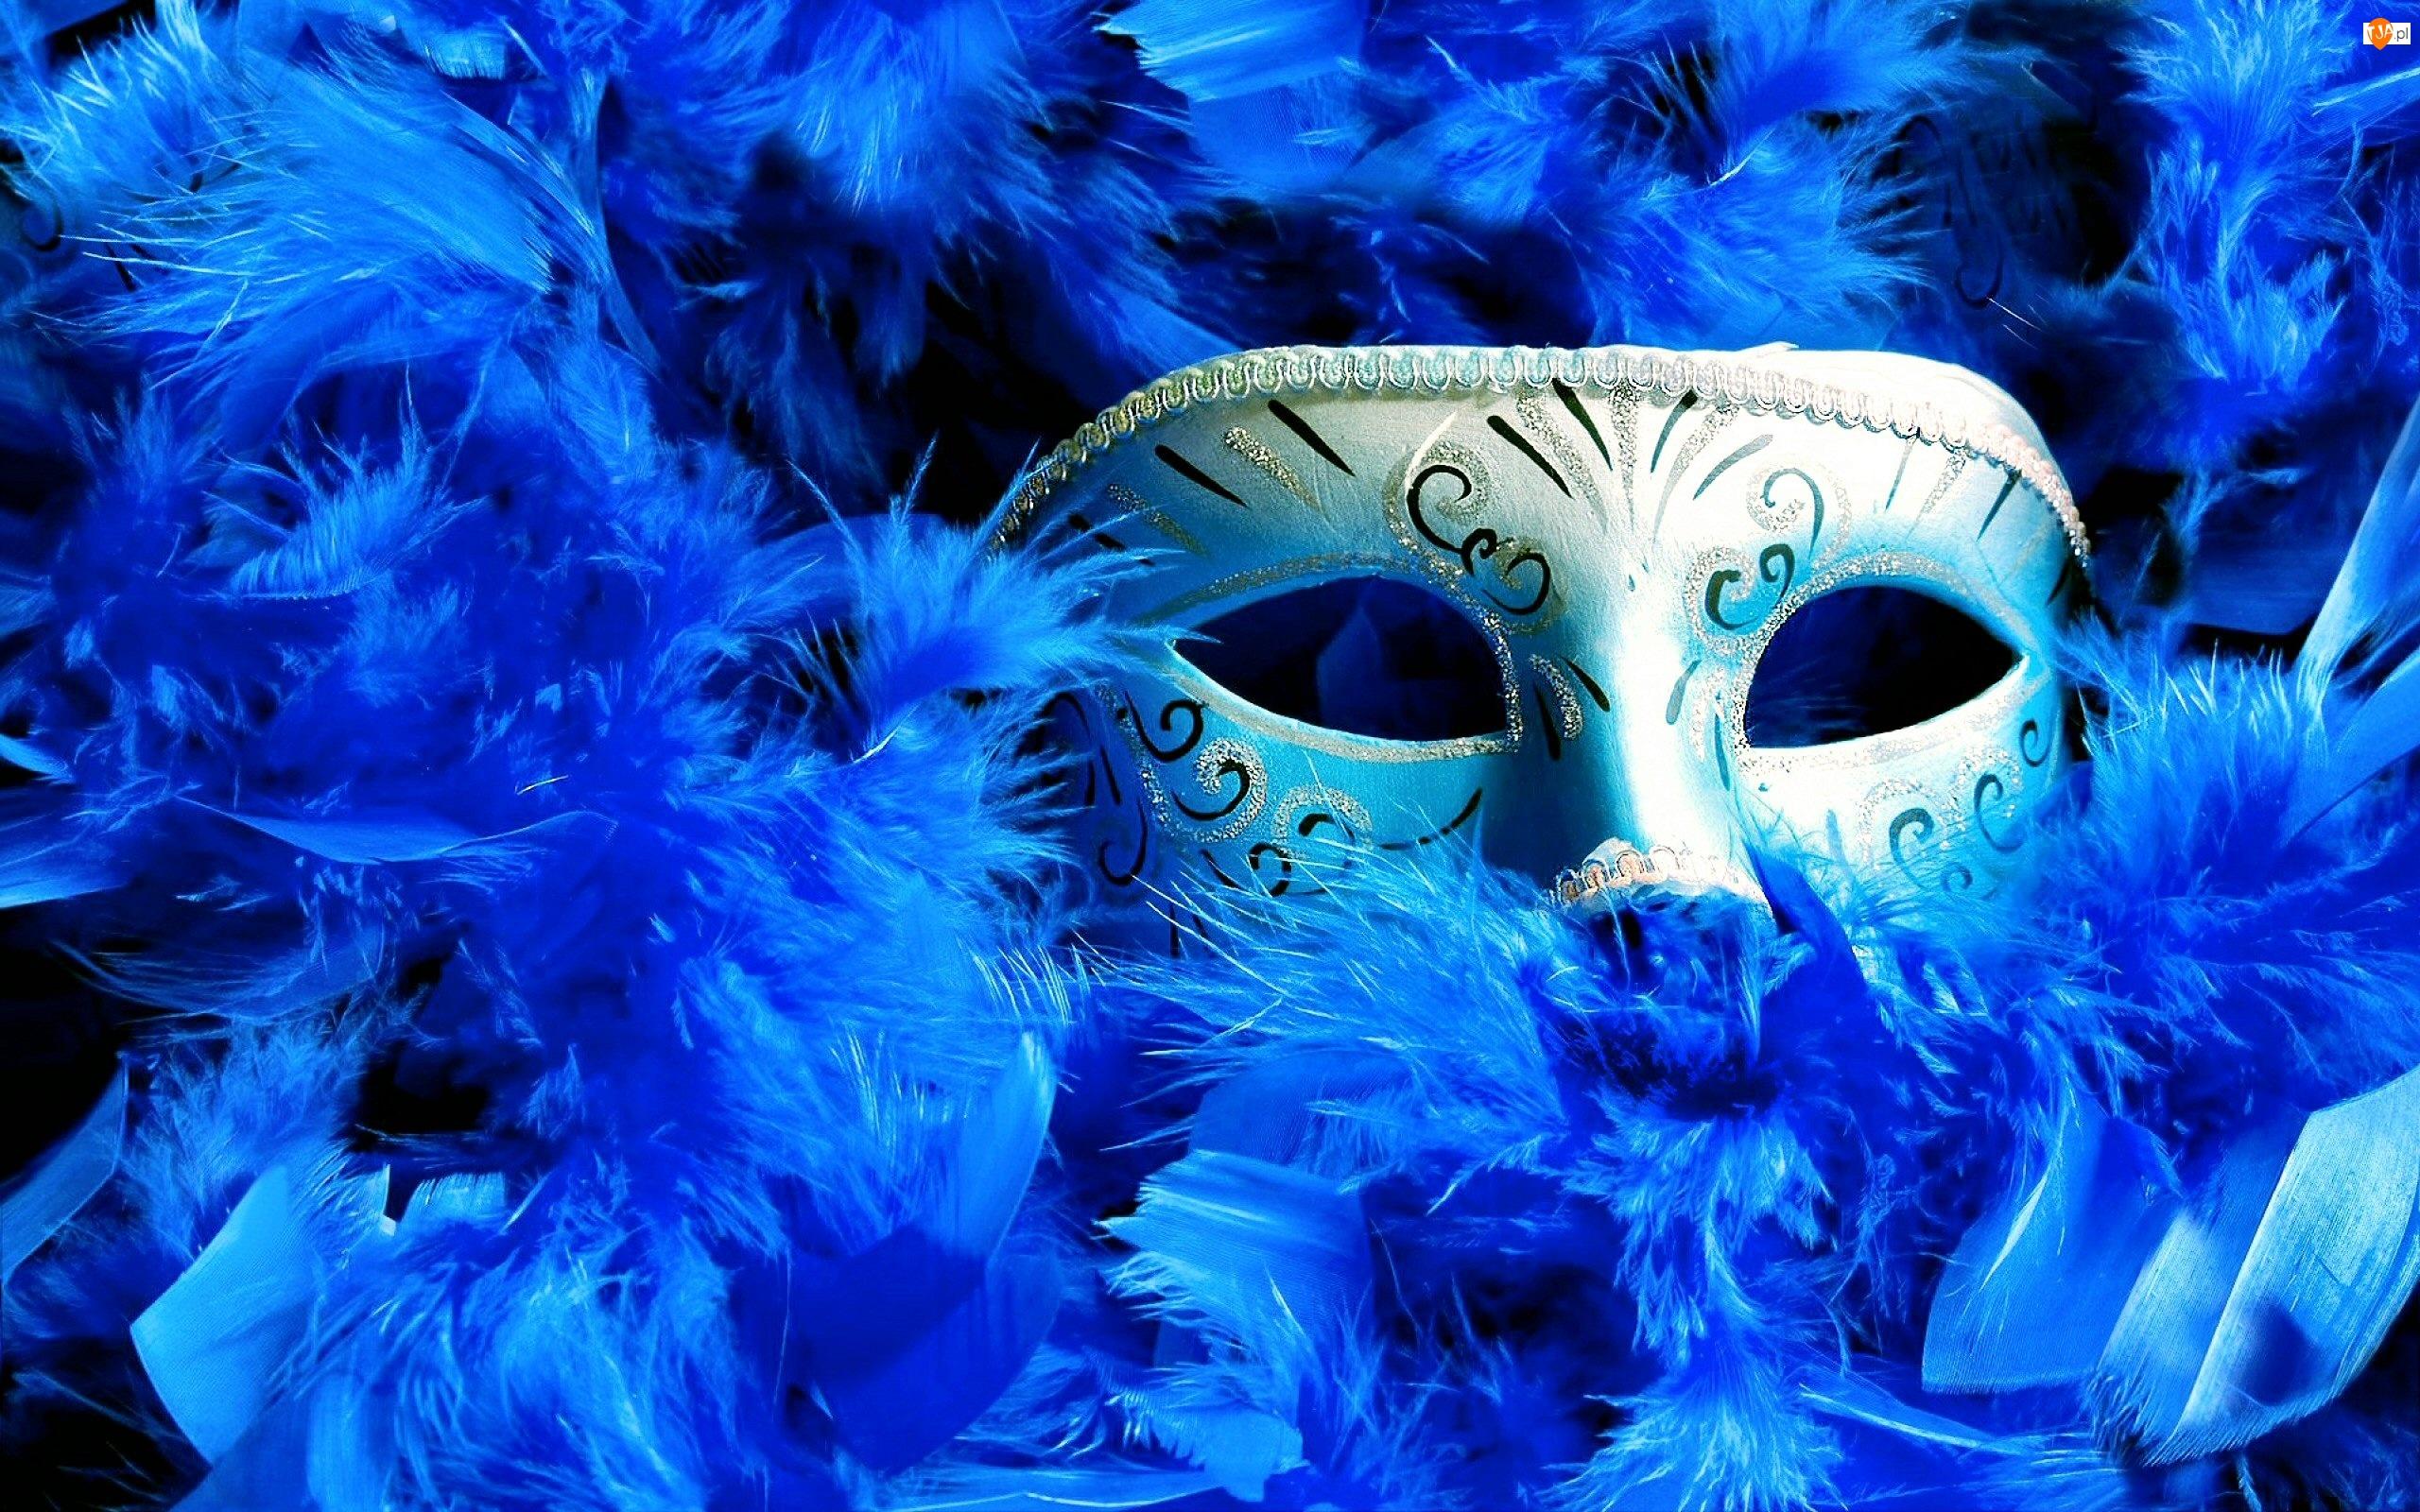 Maska, Niebieskie, Pióra